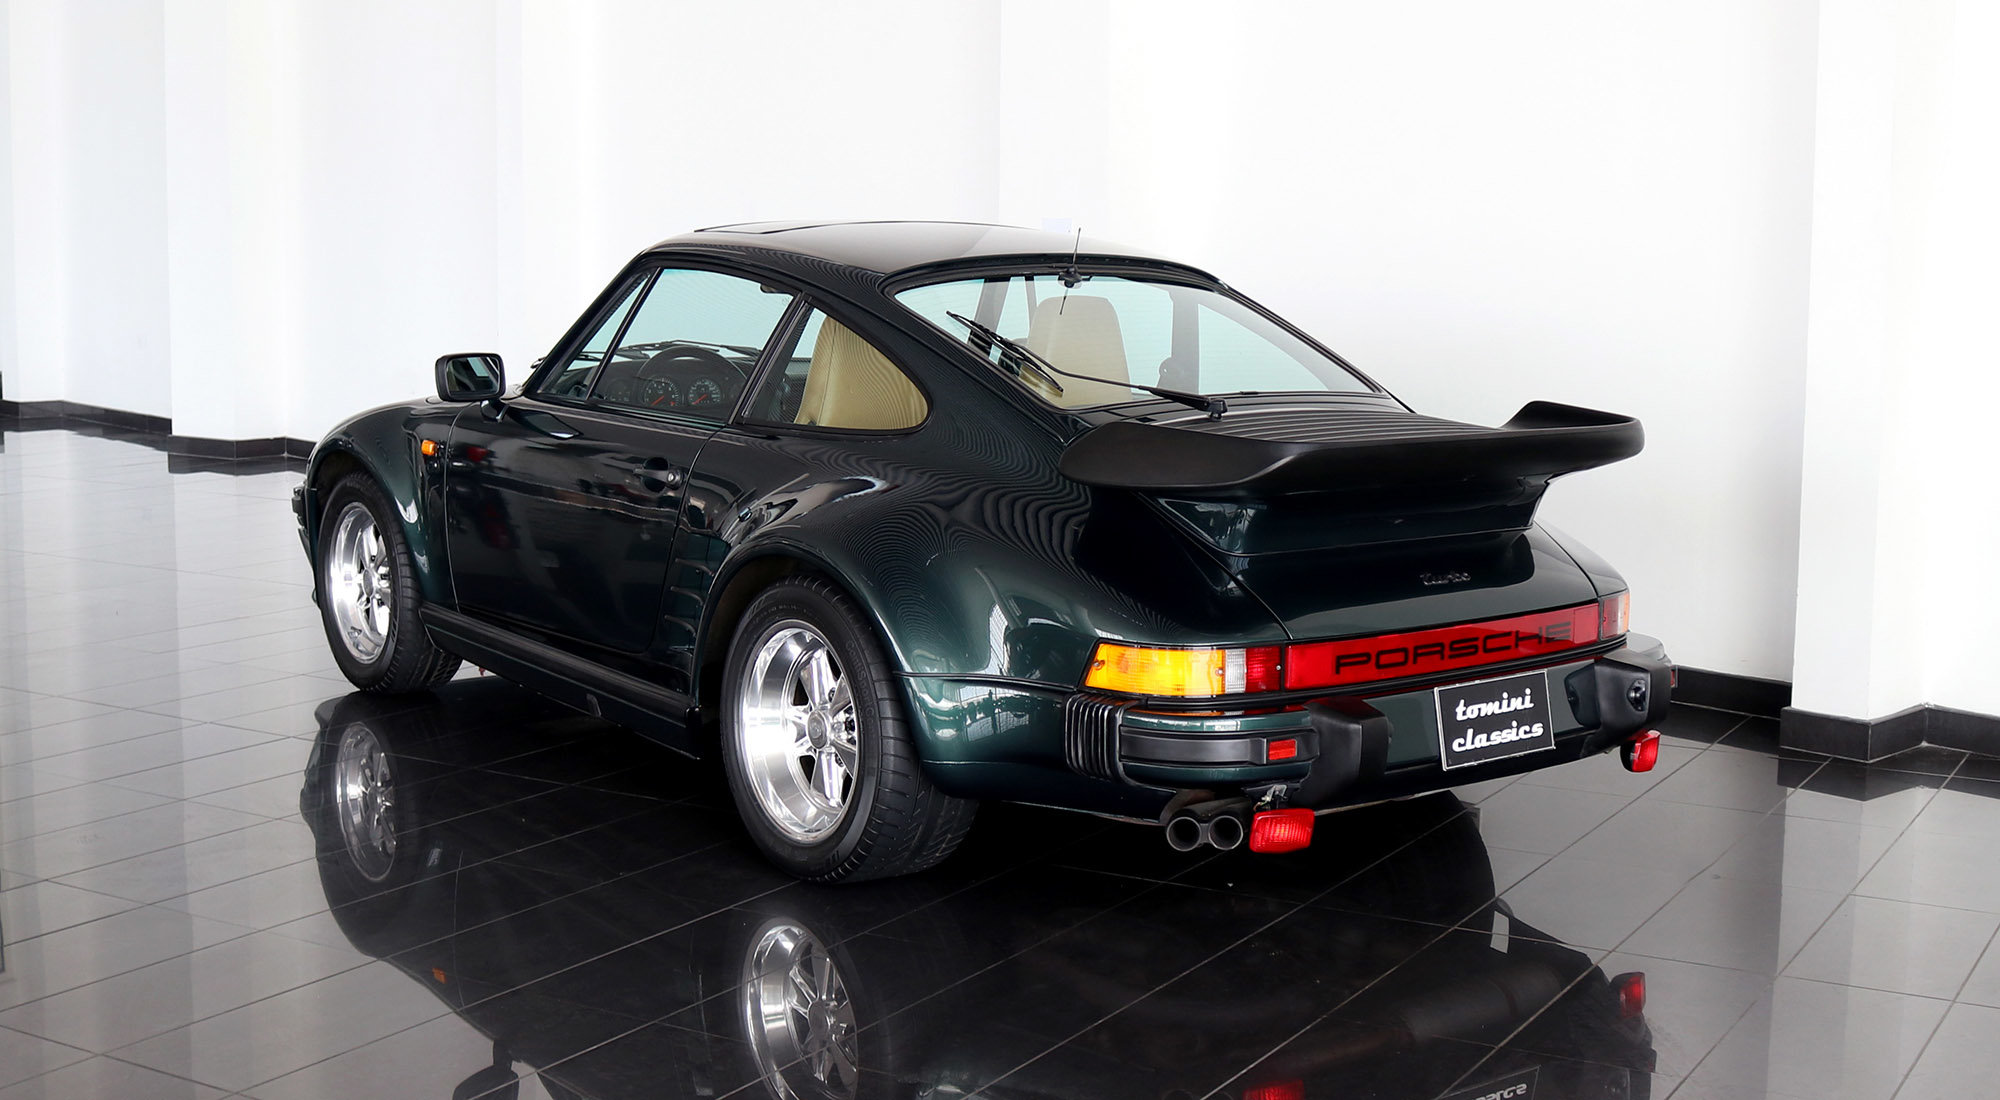 Porsche 930 SE Slantnose / Flachbau (1986) For Sale (picture 3 of 6)